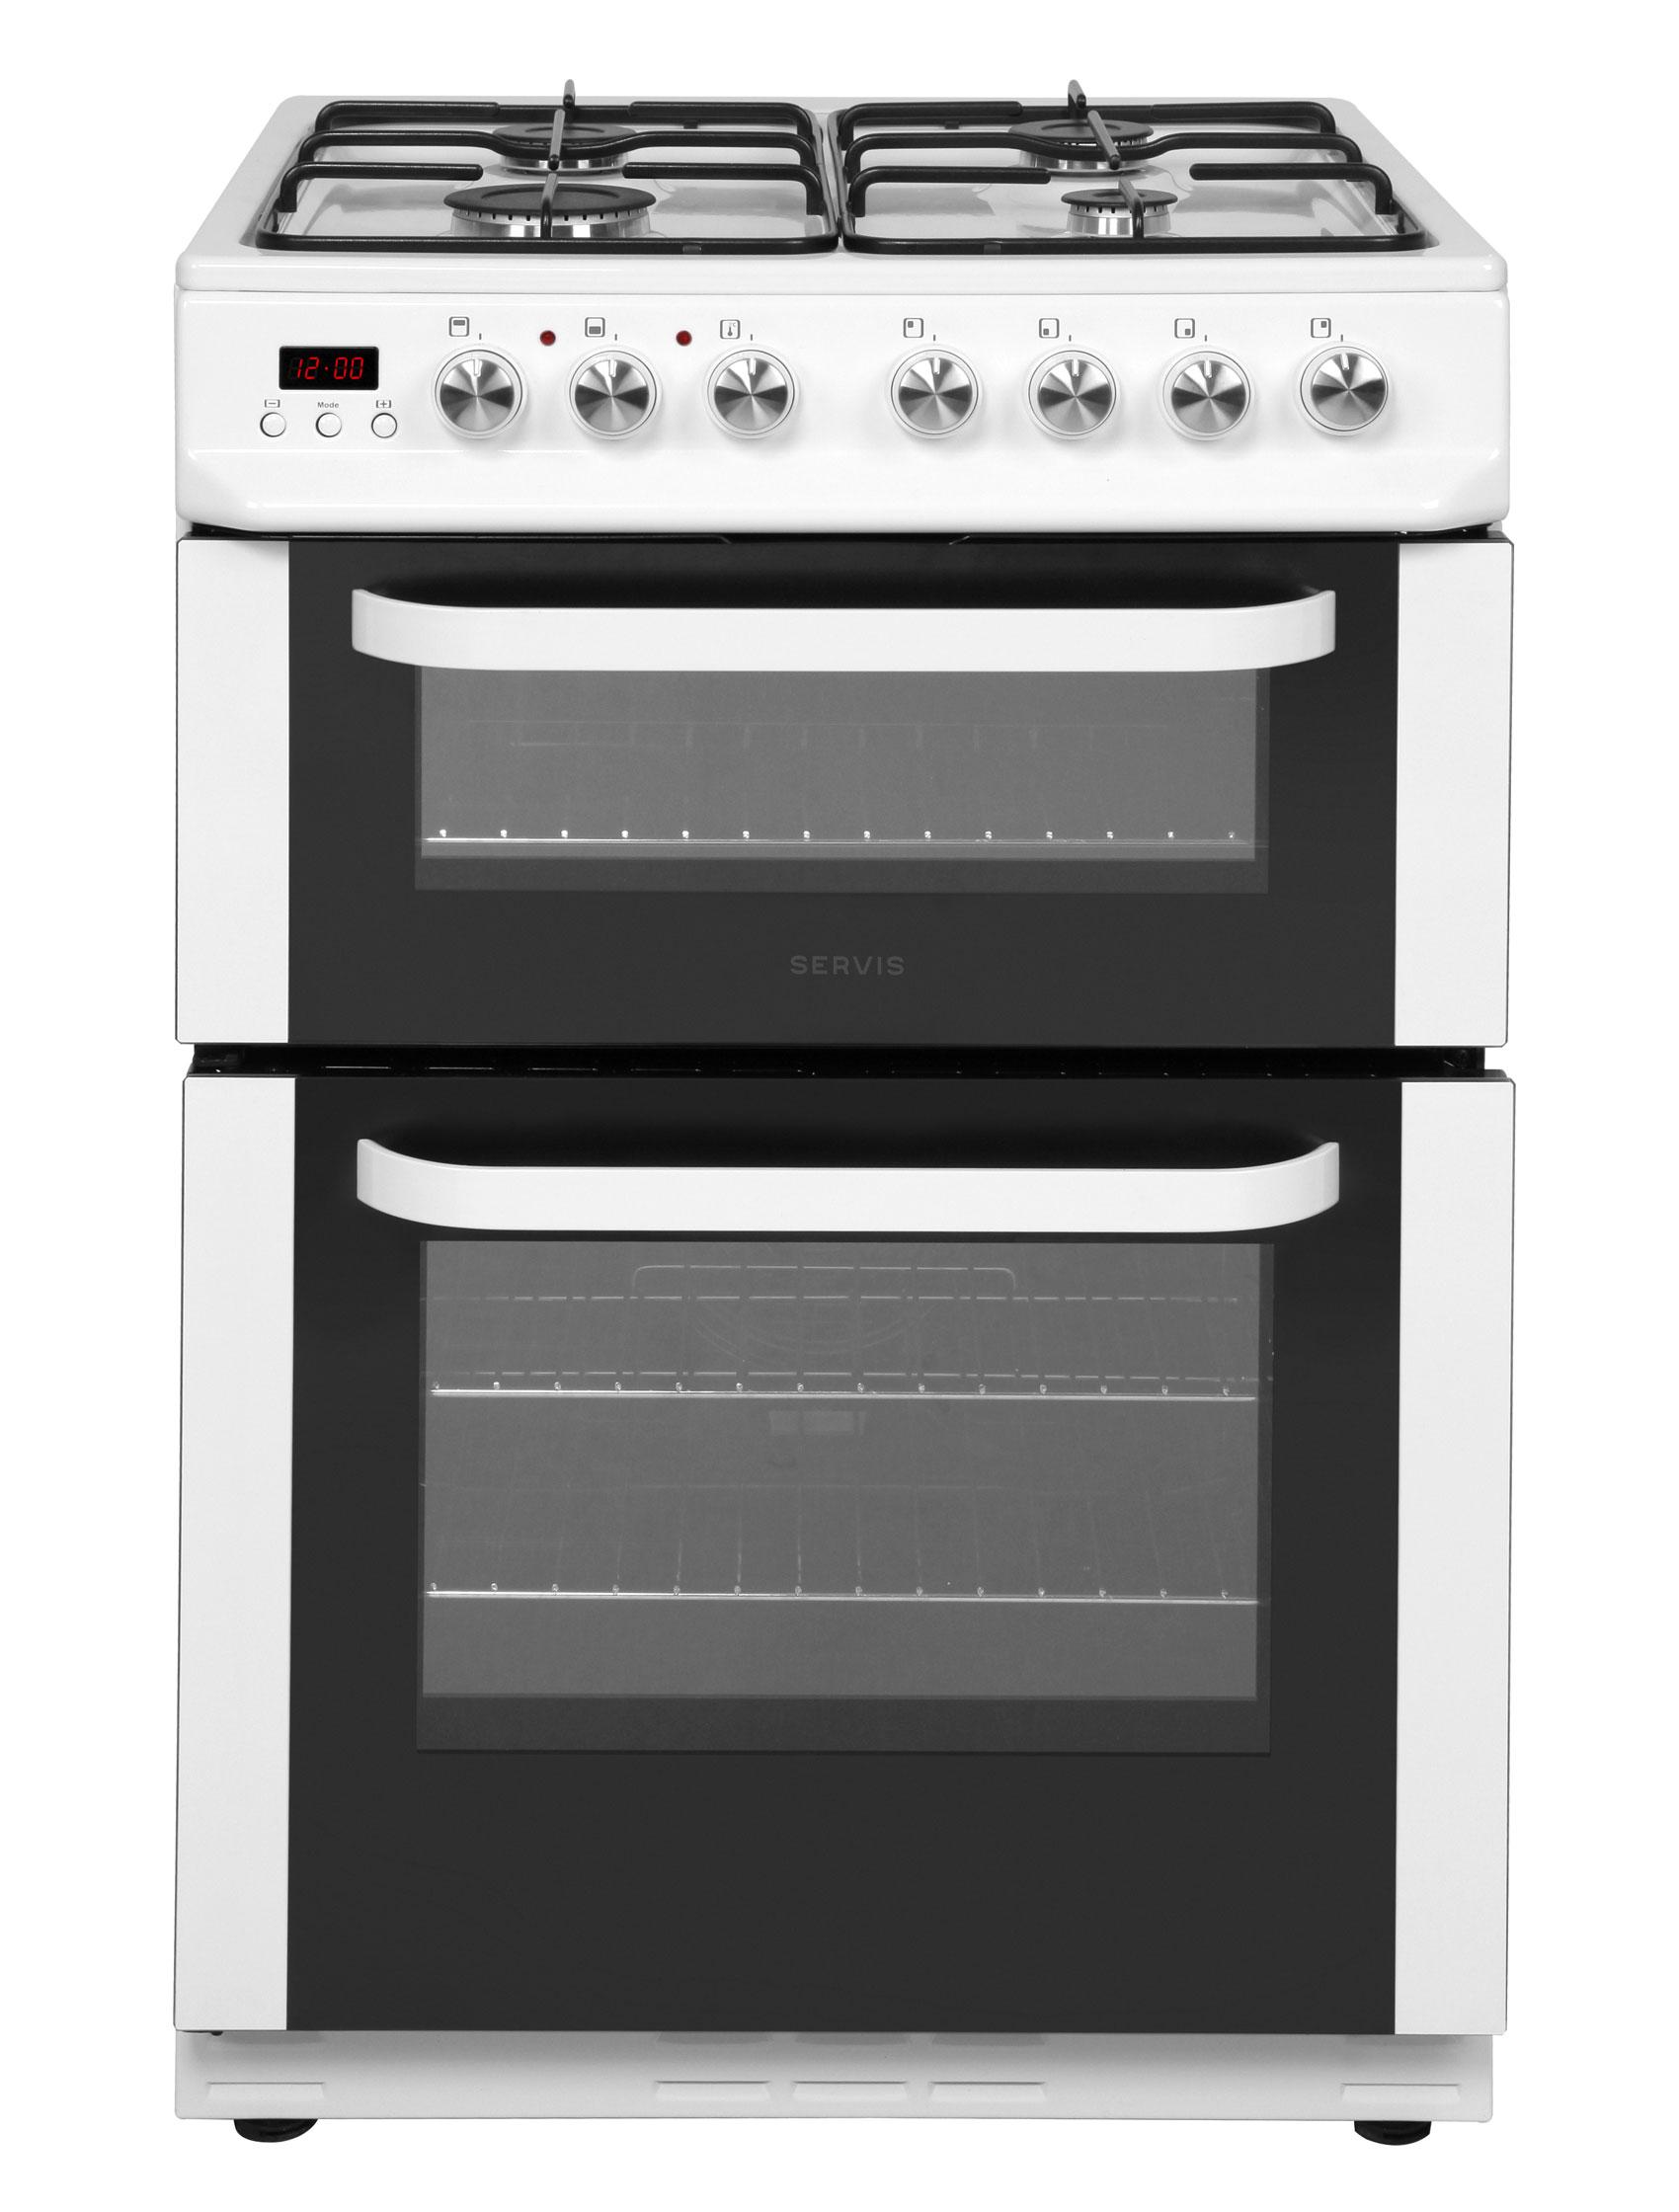 cooker wiring diagrams uk bosch pir diagram servis dual fuel cookers